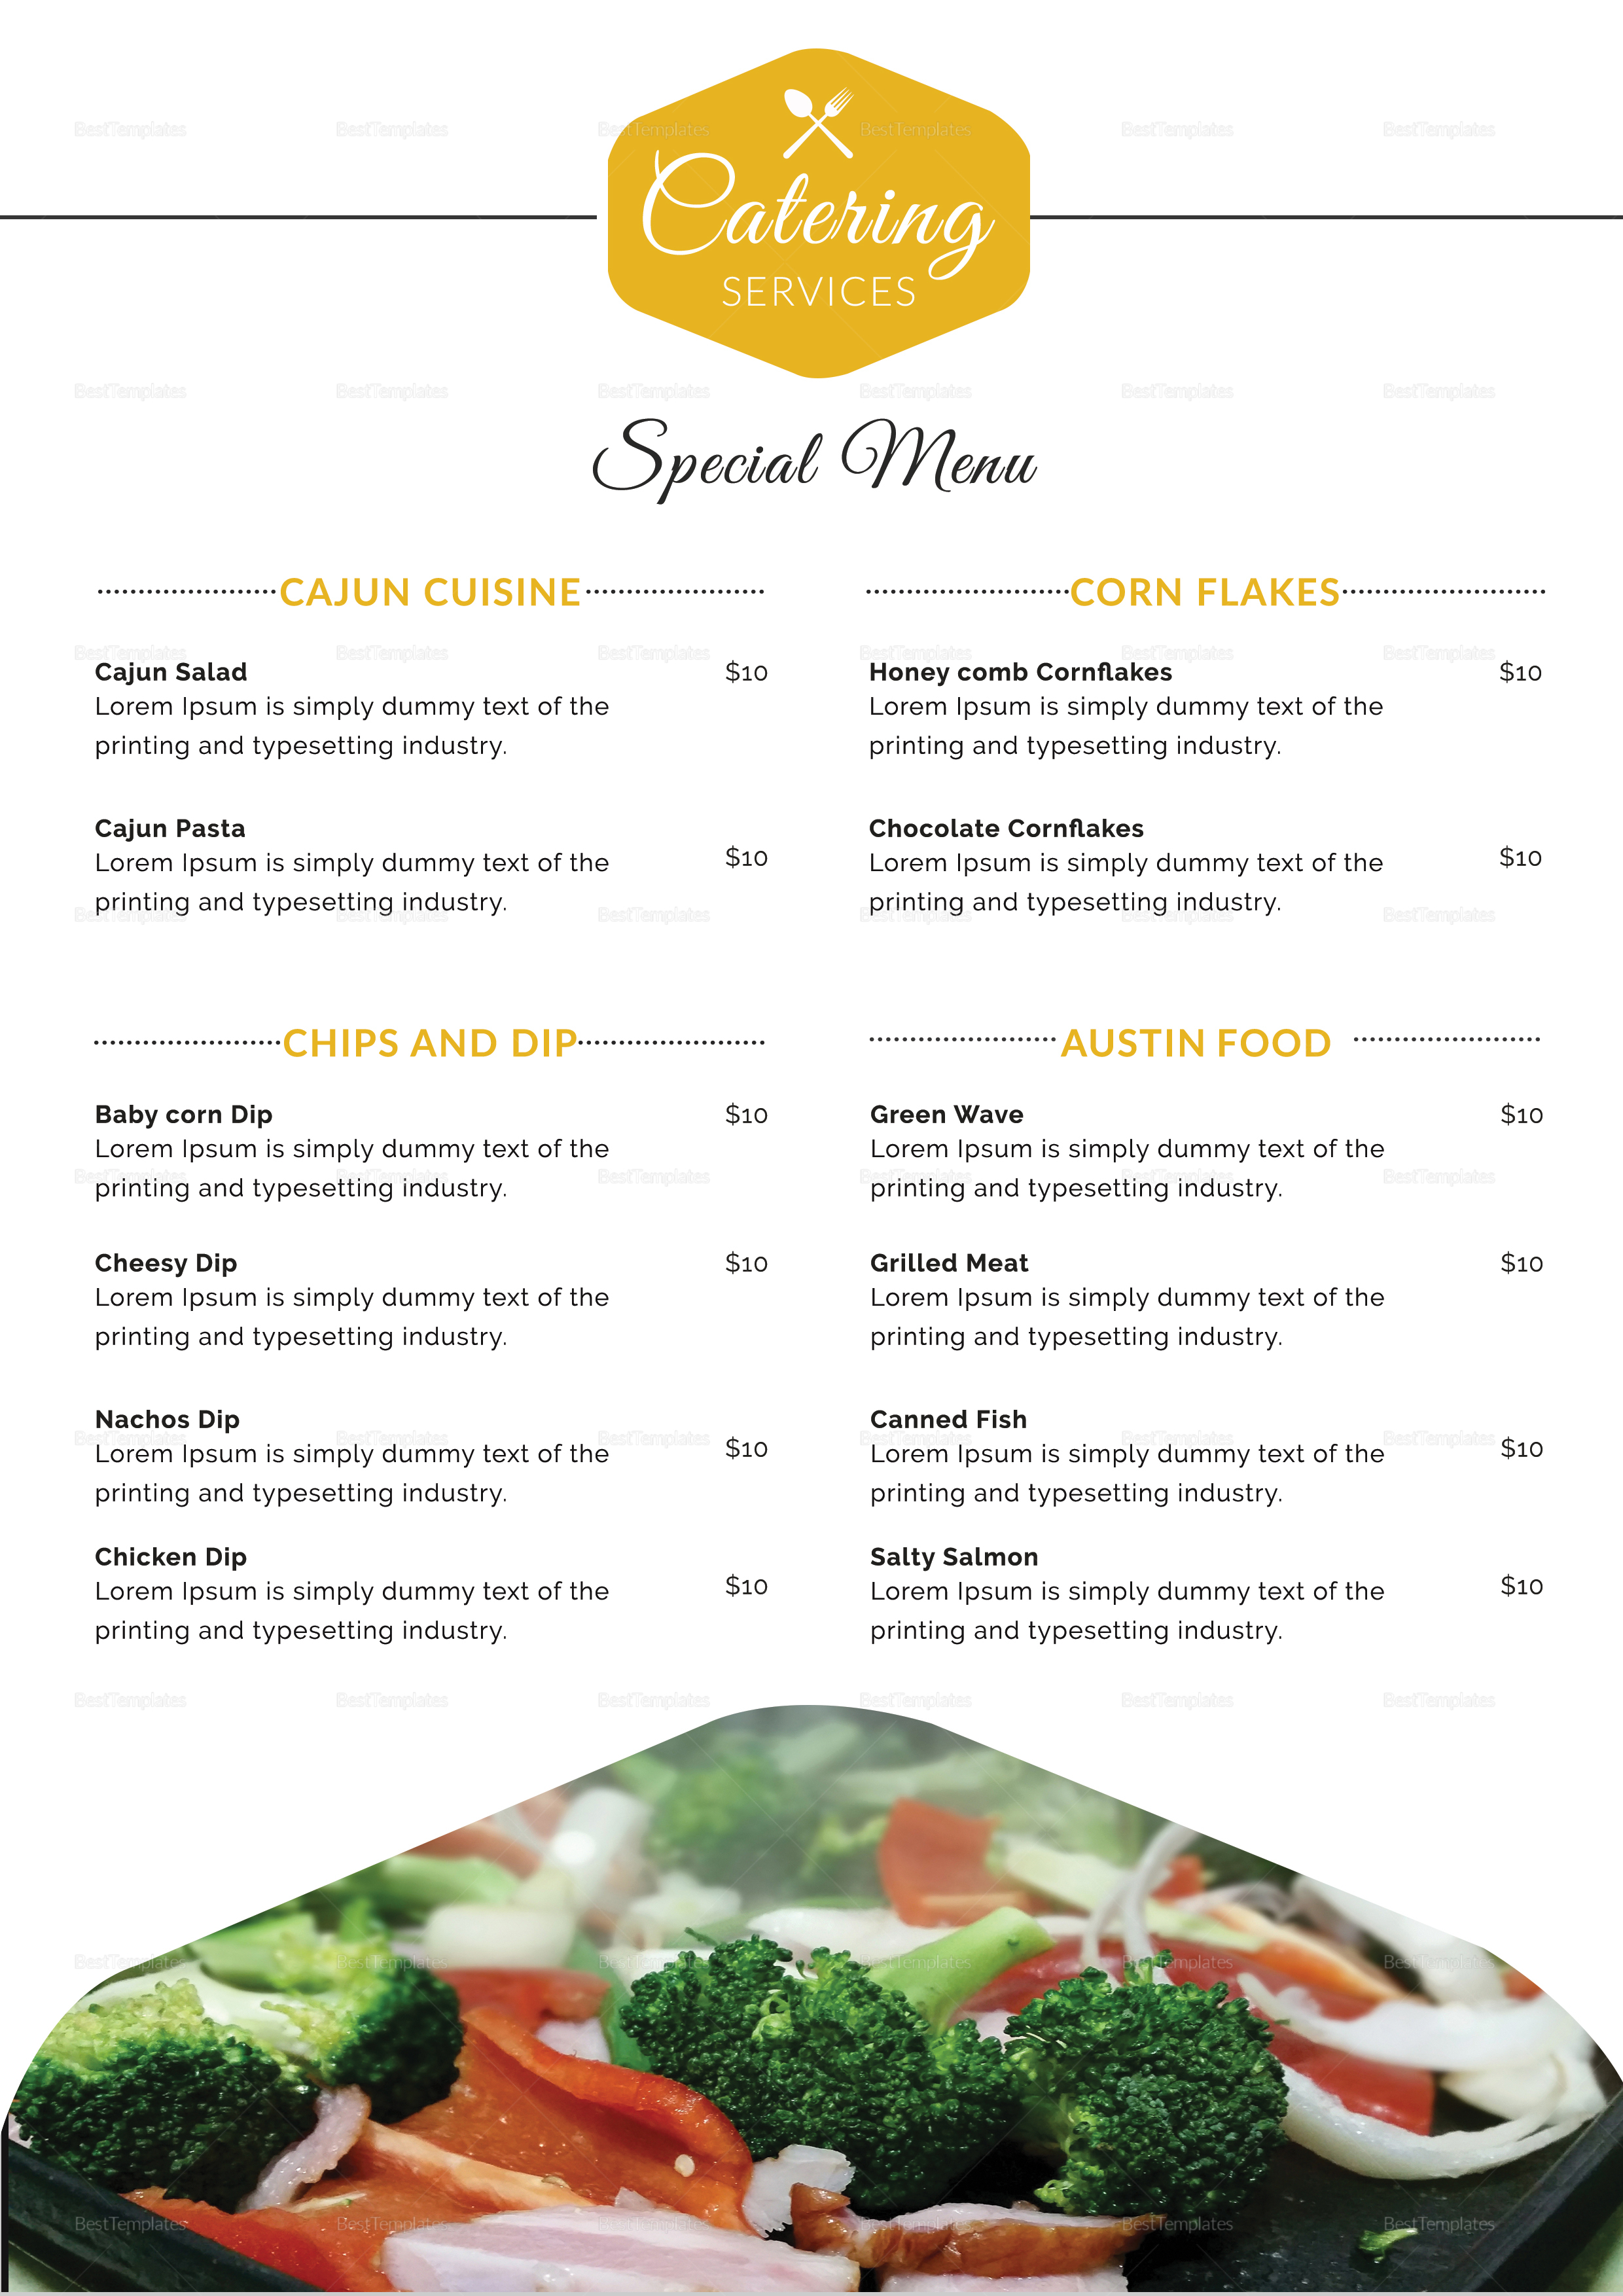 Food Catering Service Menu